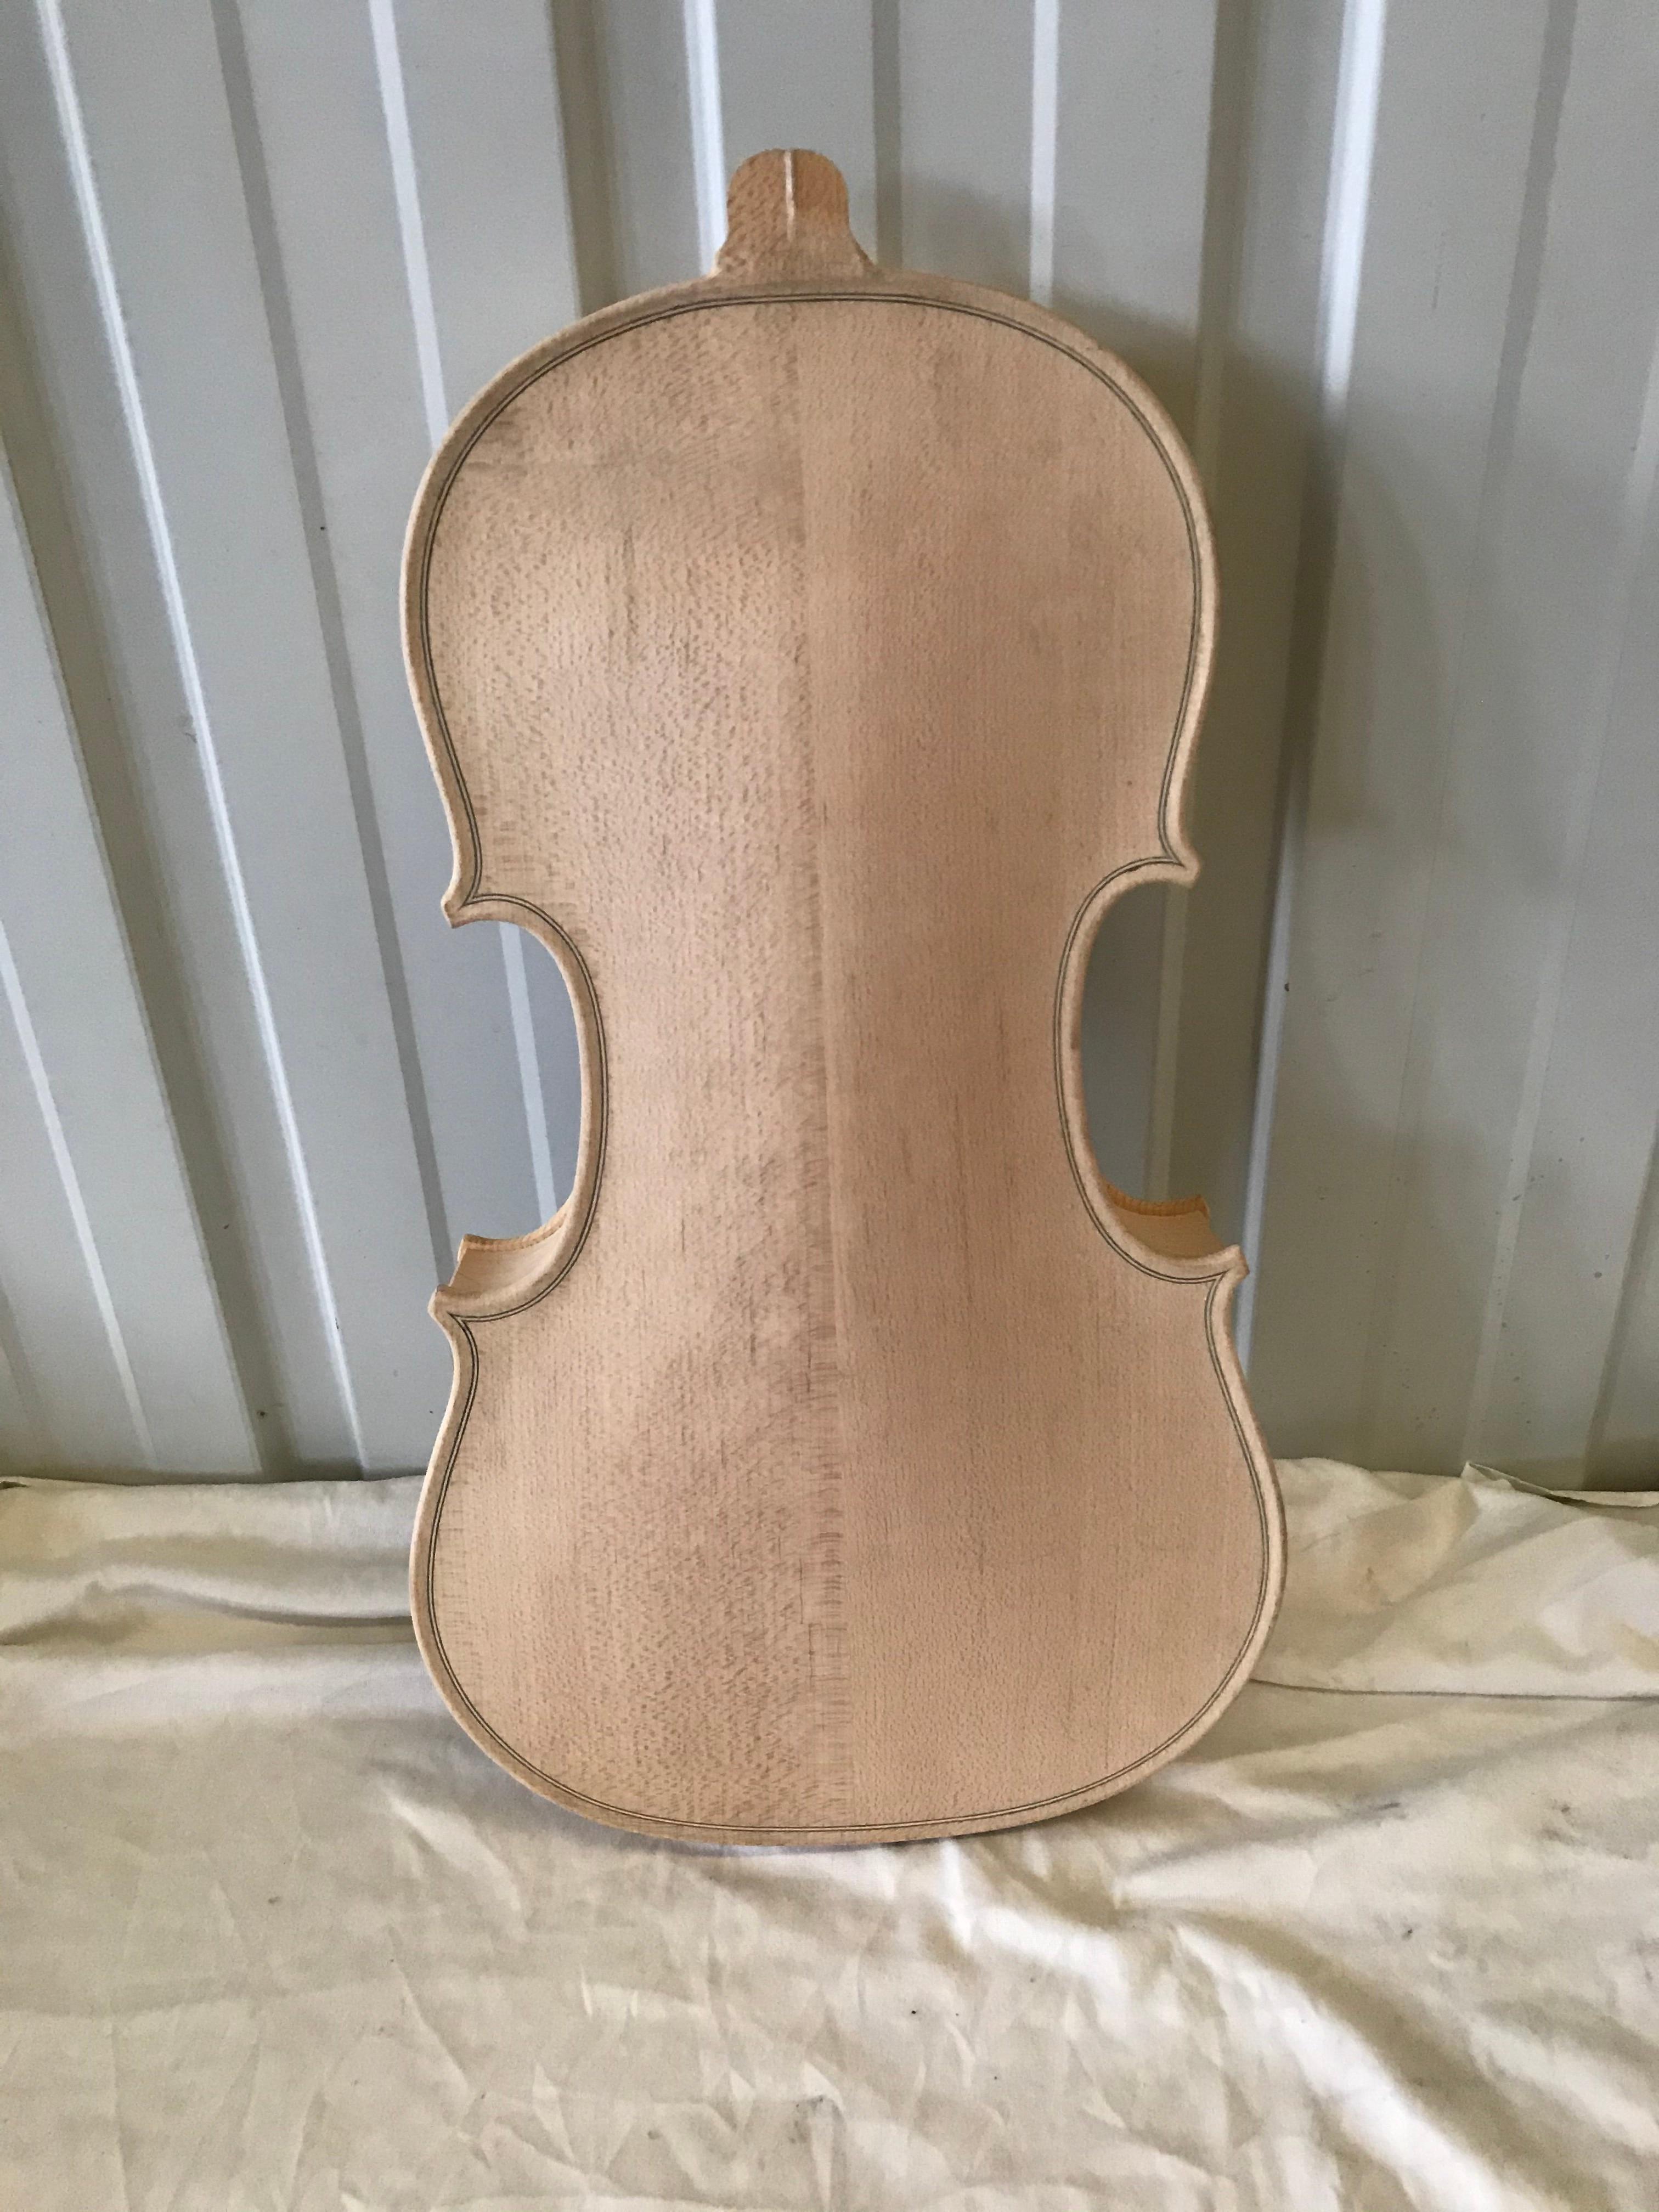 100% Handmade White 4/4 Violin Body Unfinished Solid Wood Blank Violin Barrel  Stradivarius Violin enlarge